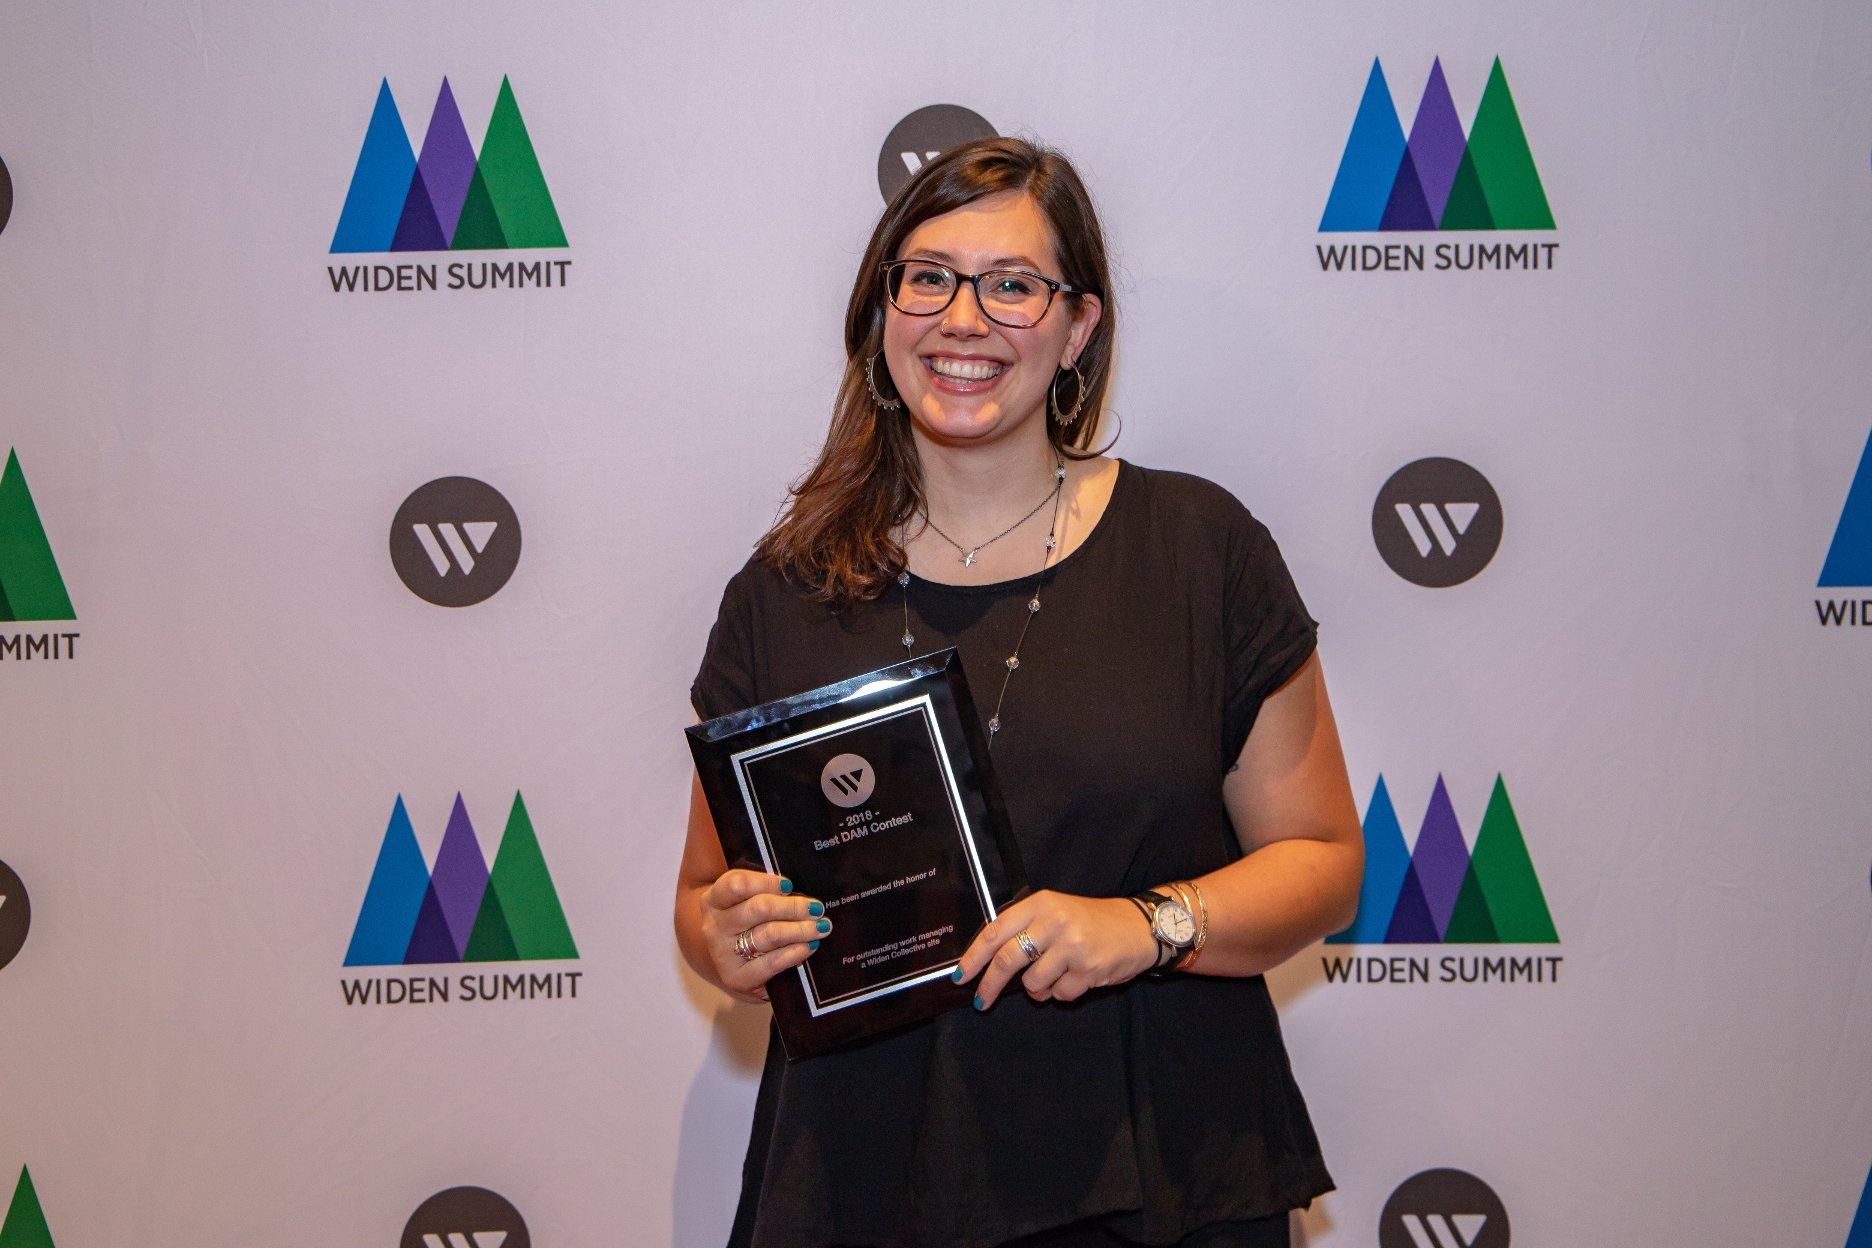 Caroline proudly holding her Best DAM award